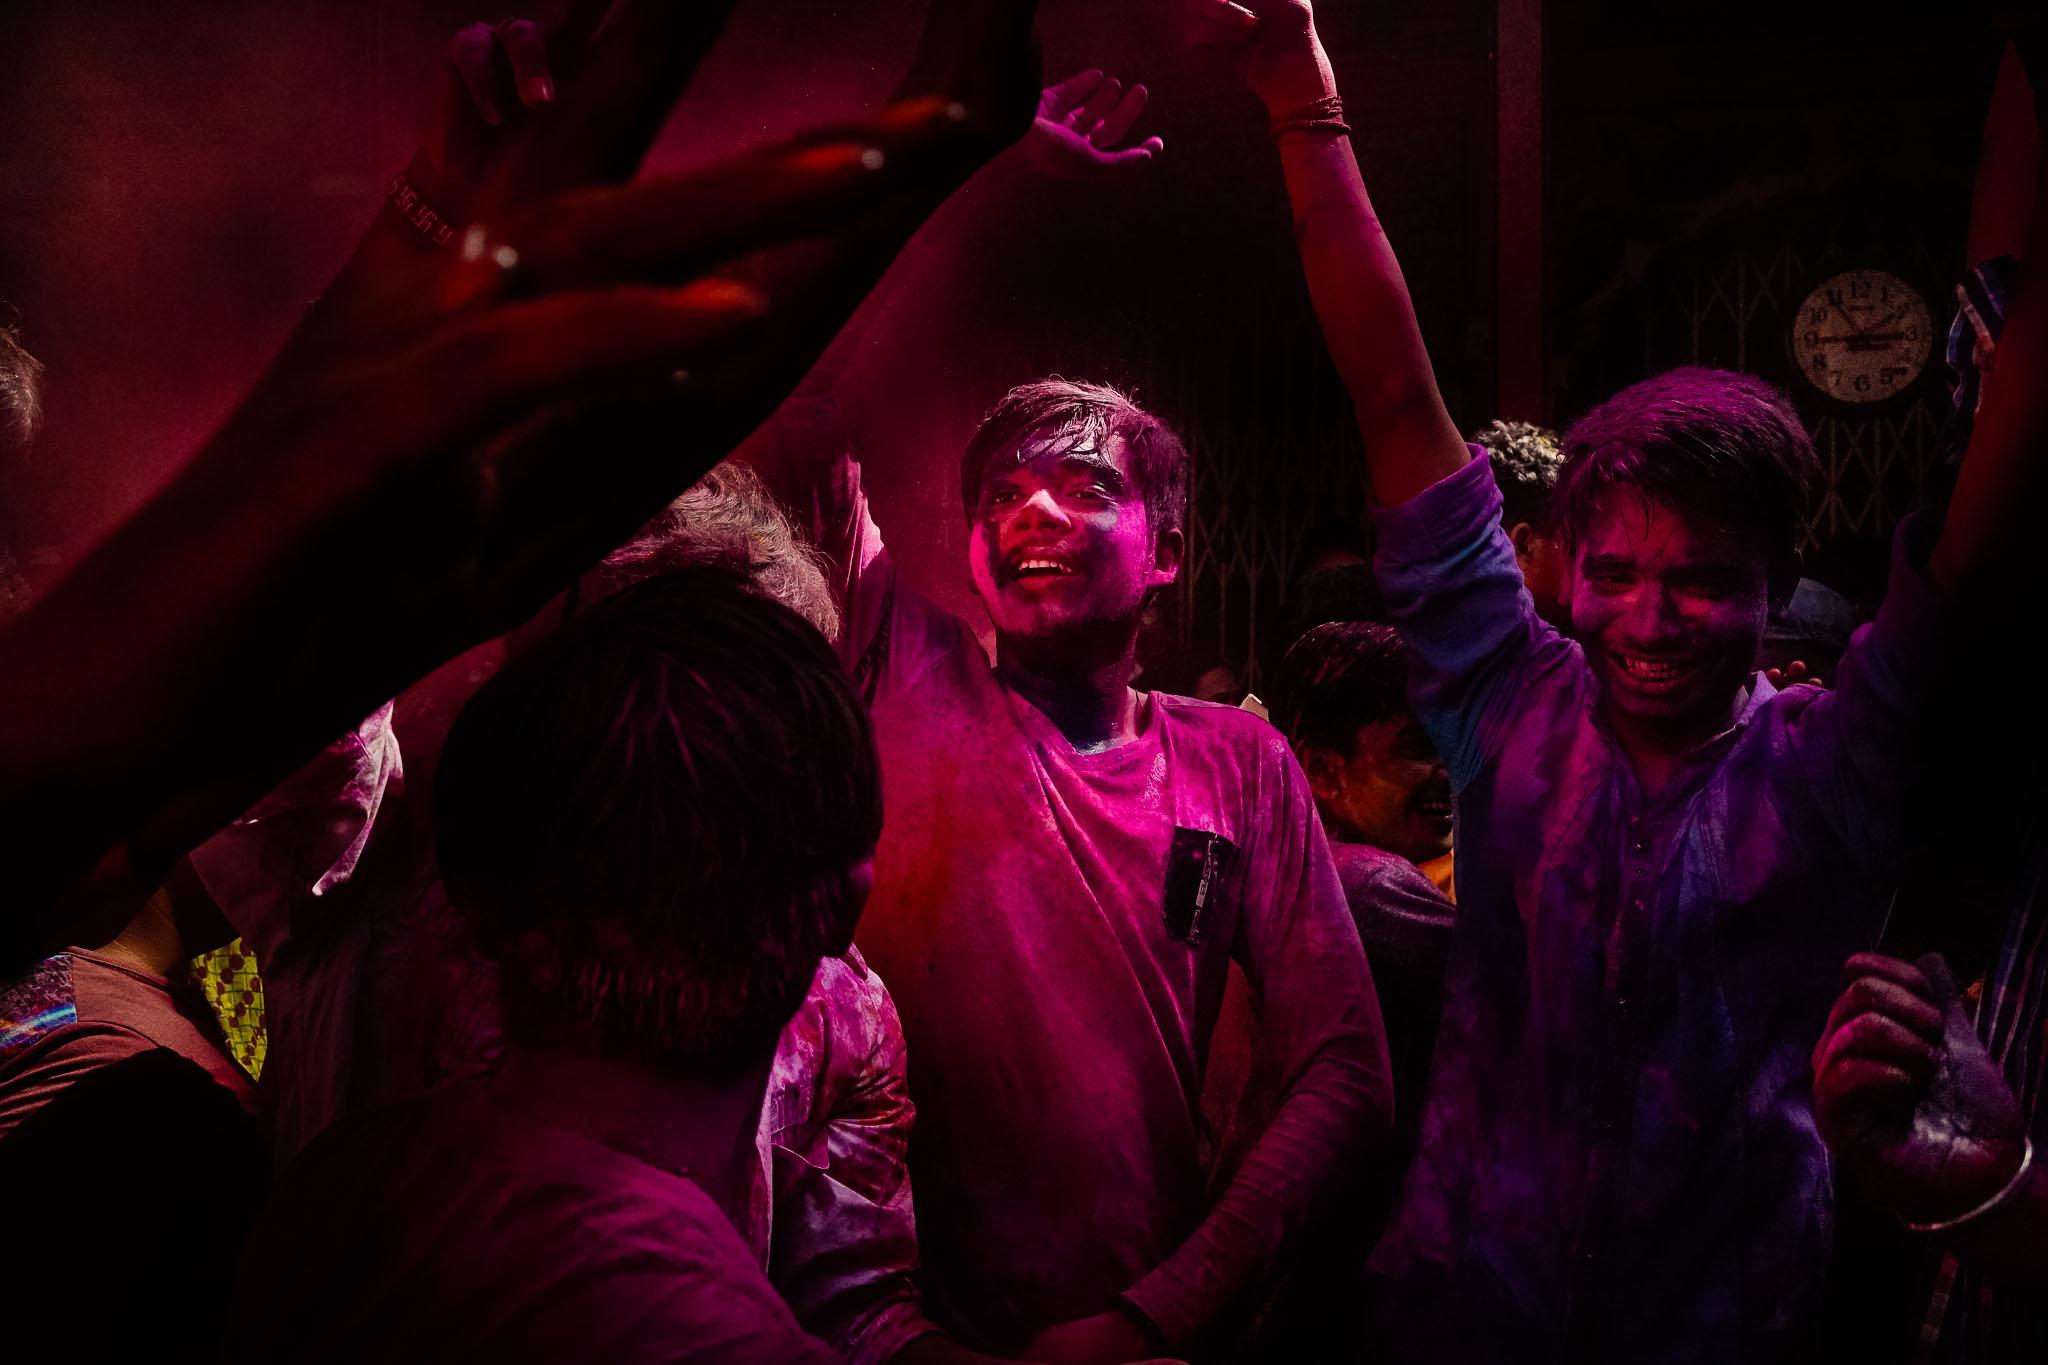 Holi Street Photography